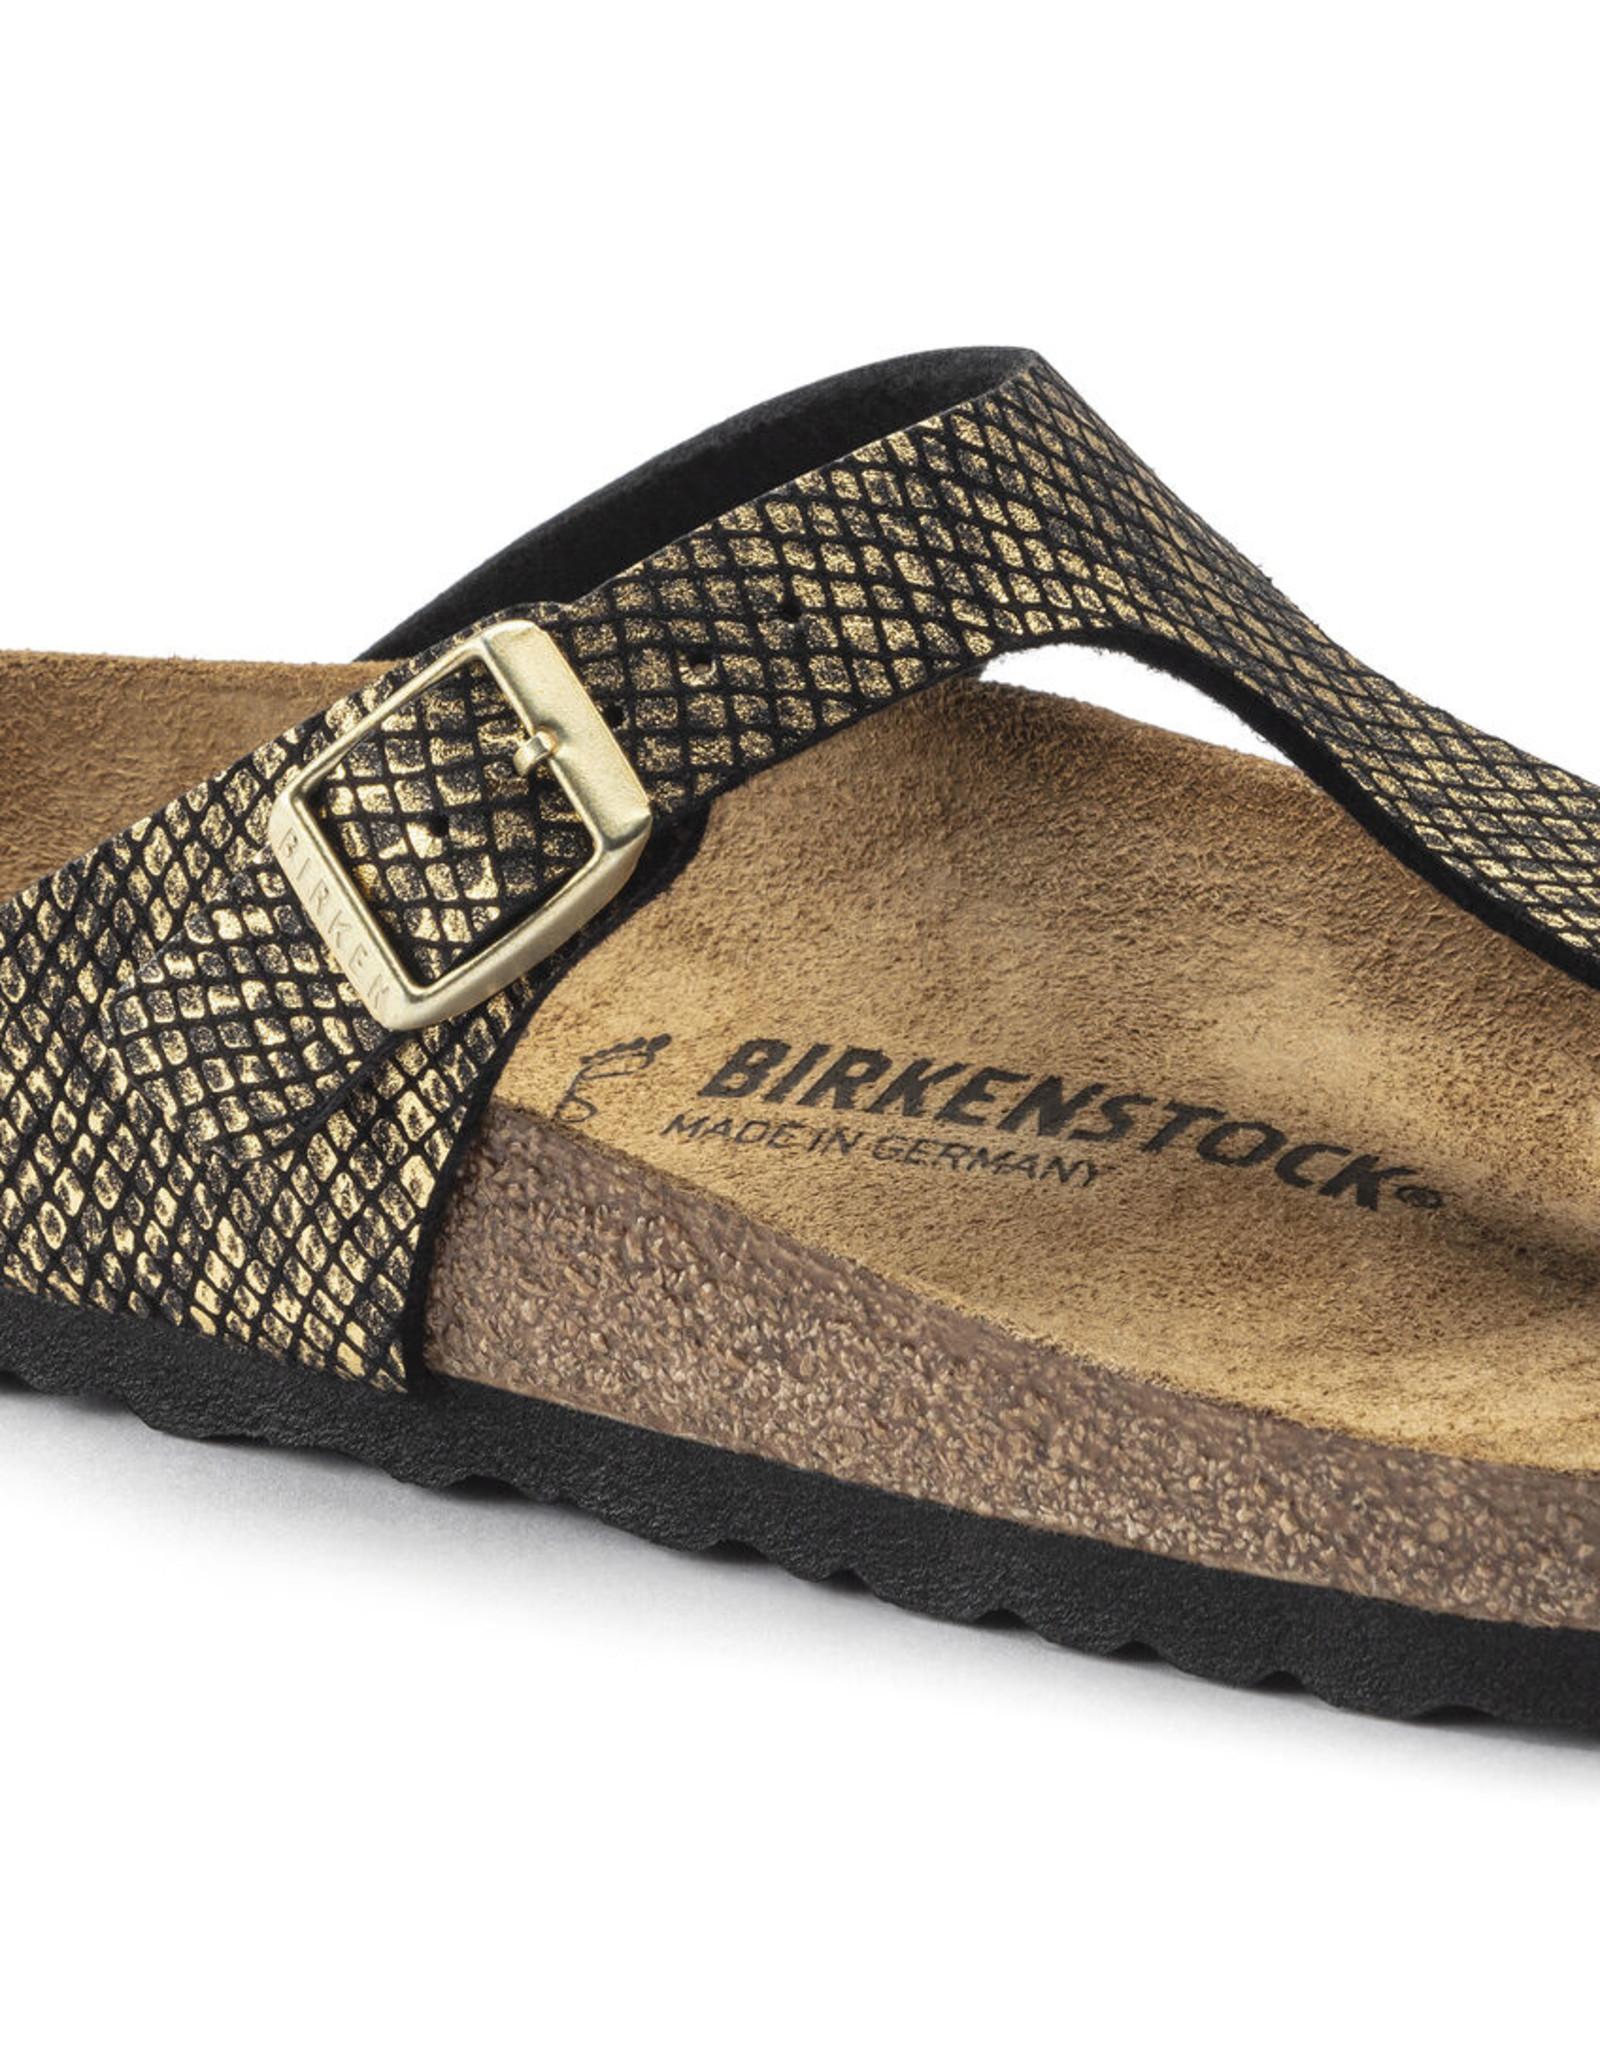 BIRKENSTOCK GIZEH MICROFIBER-SHINY PYTHON BLACK